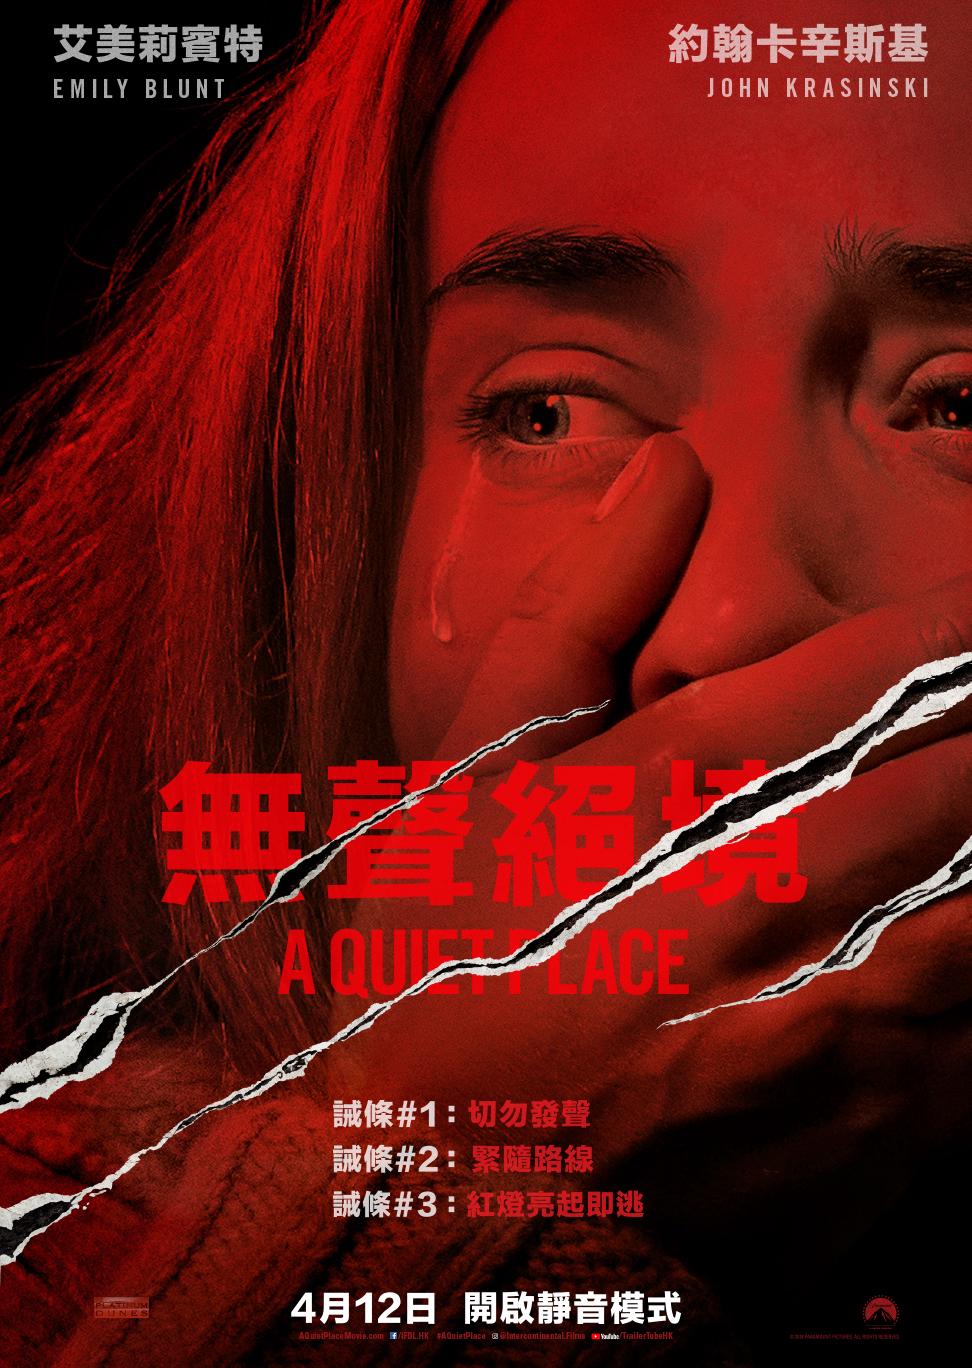 20180324_AQuietPlace_Poster.jpg